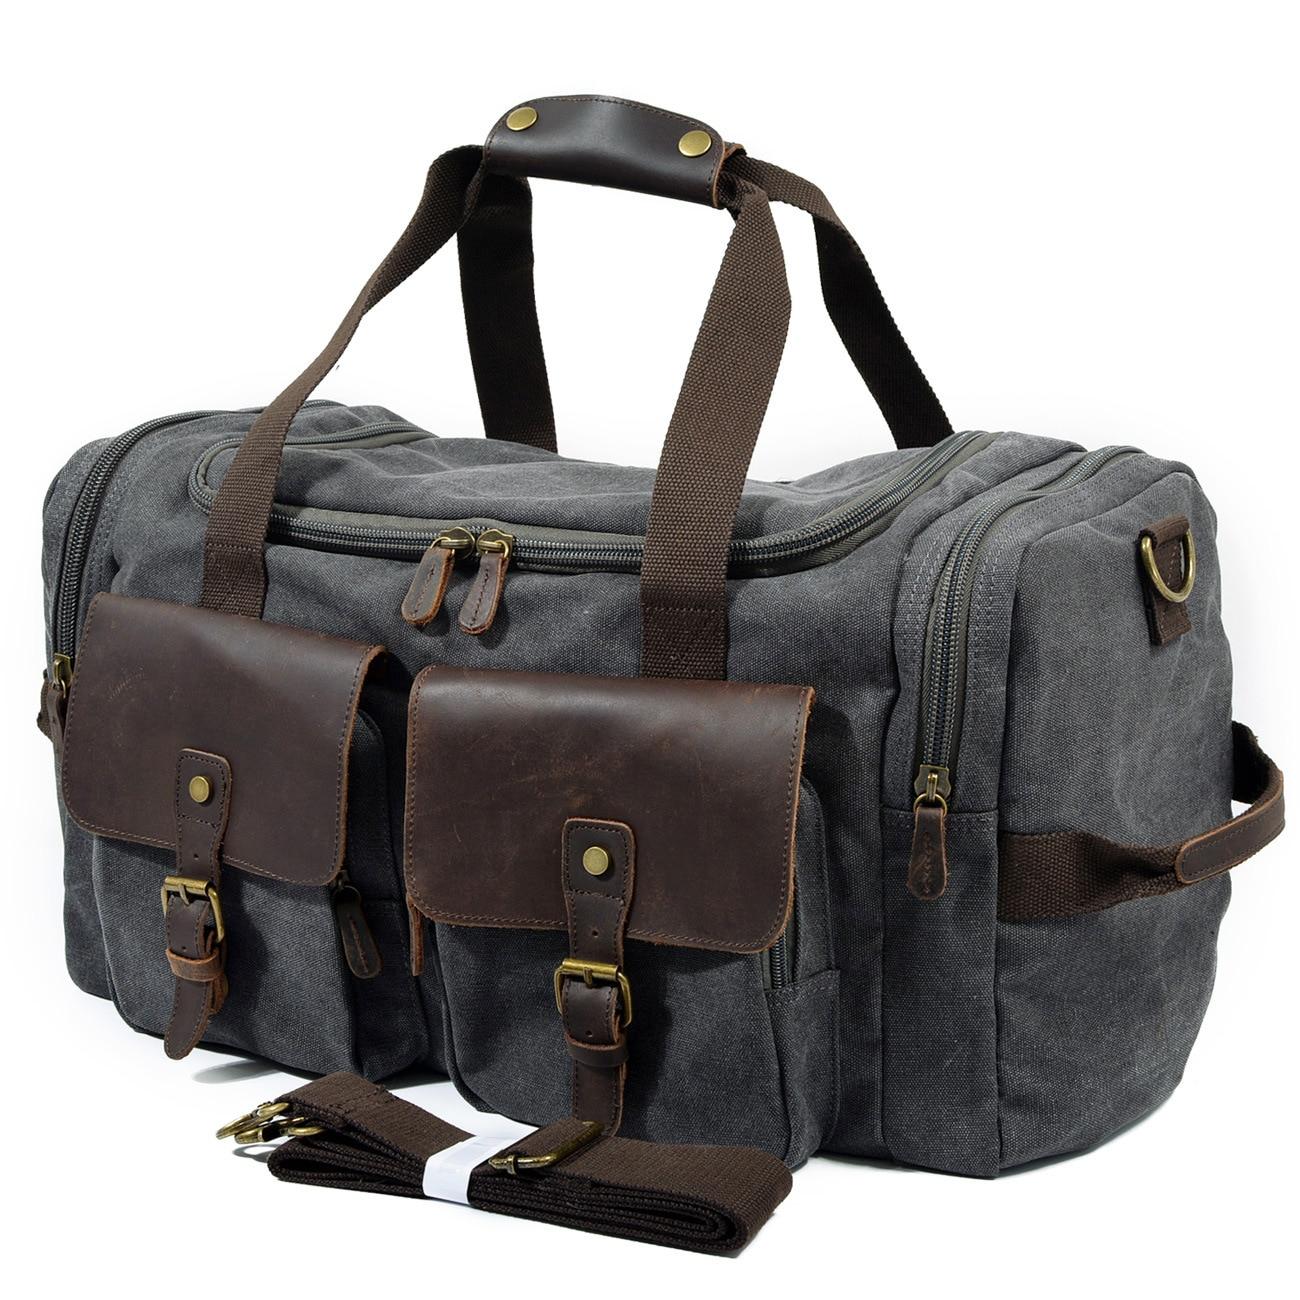 Muchuan Canvas Large Capacity Travel Bag MEN'S Handbag Casual Wear-Resistant Shoulder Bag Manufacturers Direct Selling